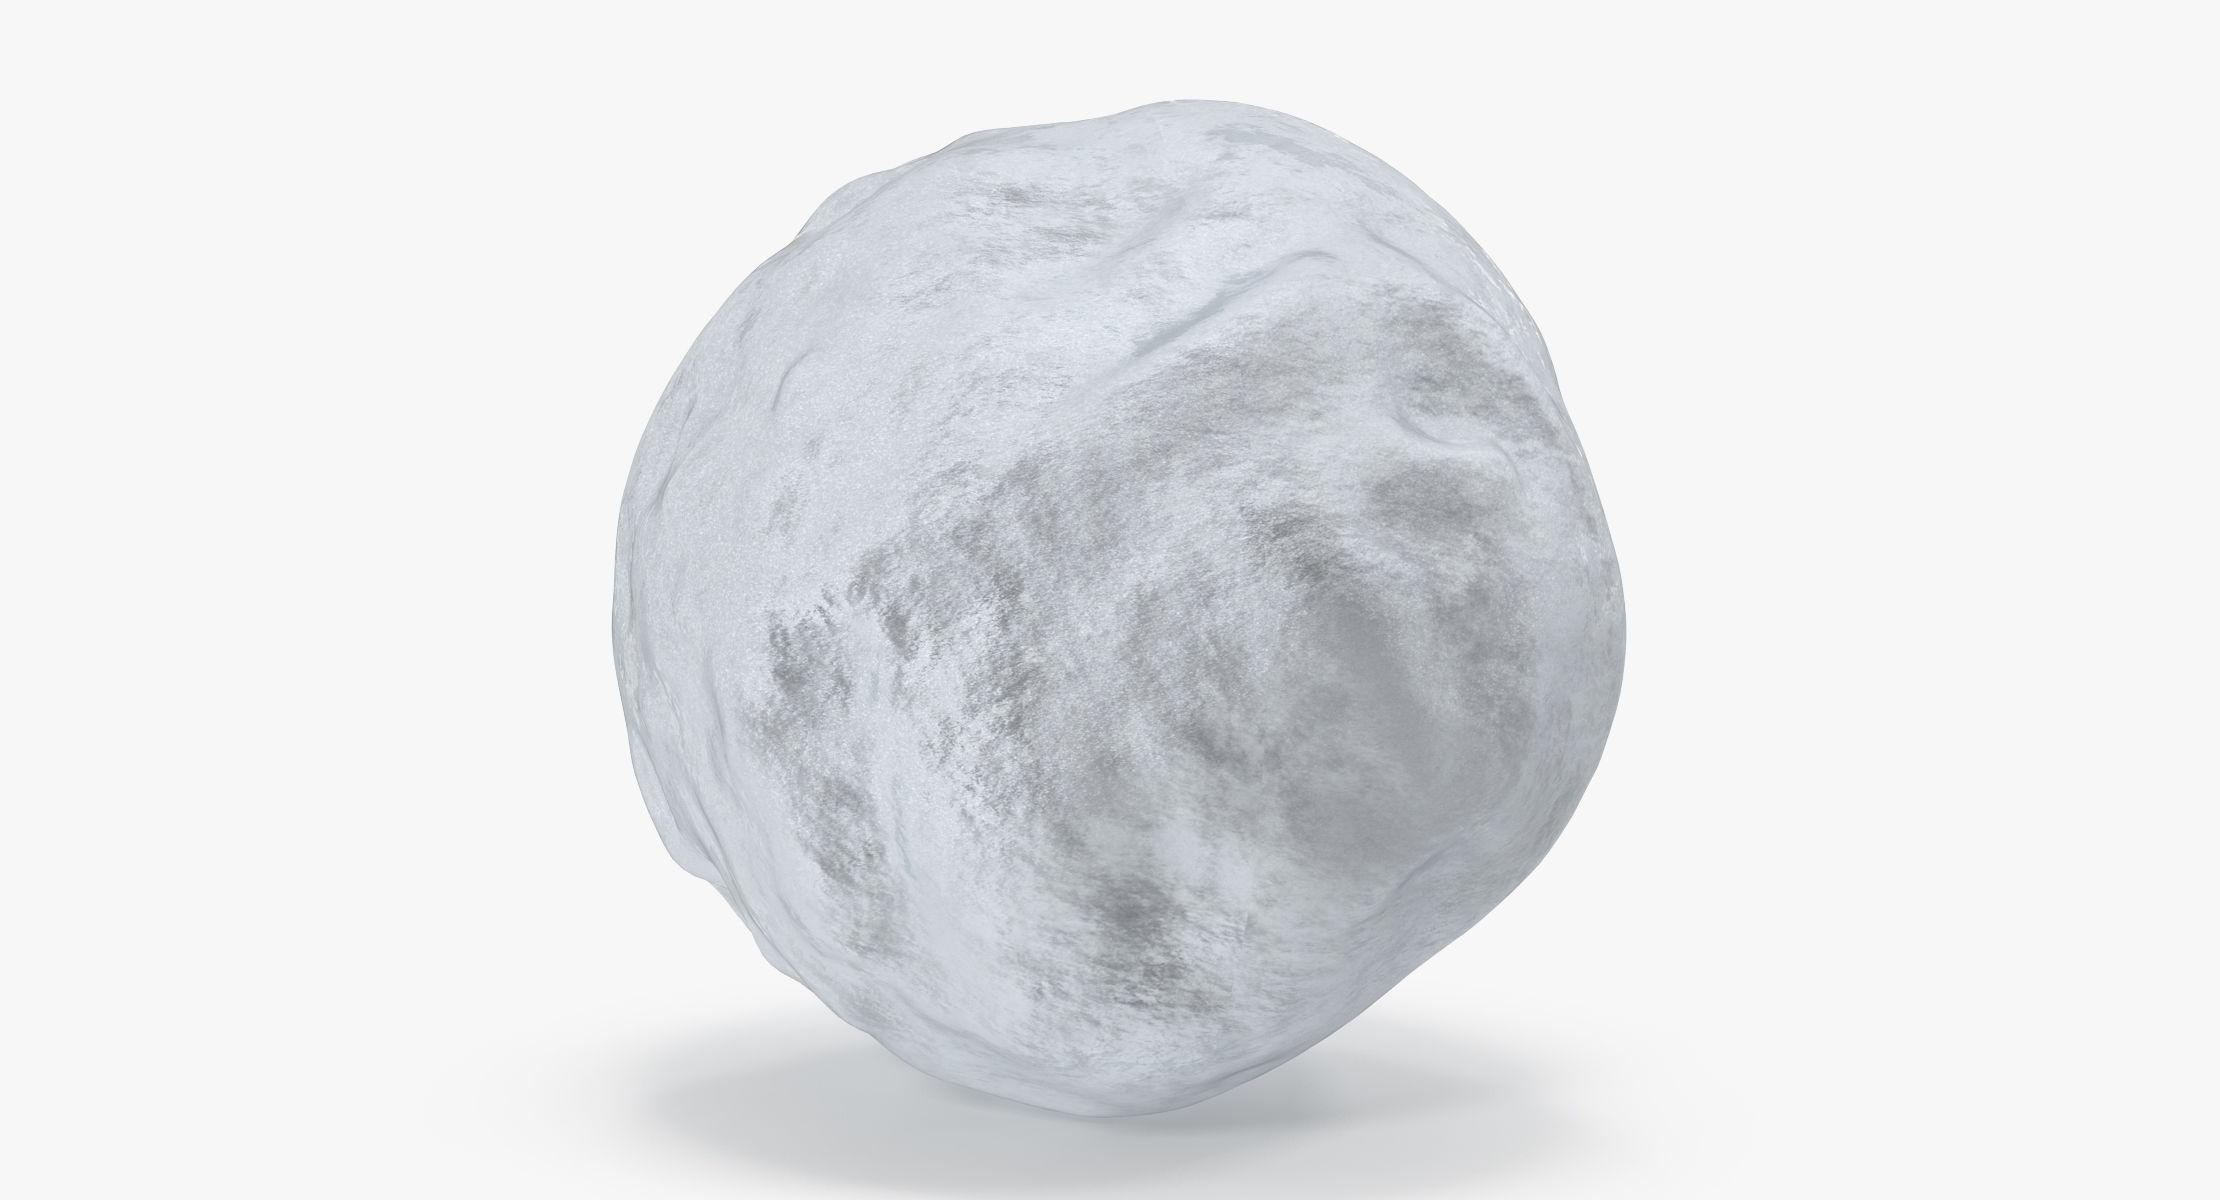 Snowball 02 - reel 1